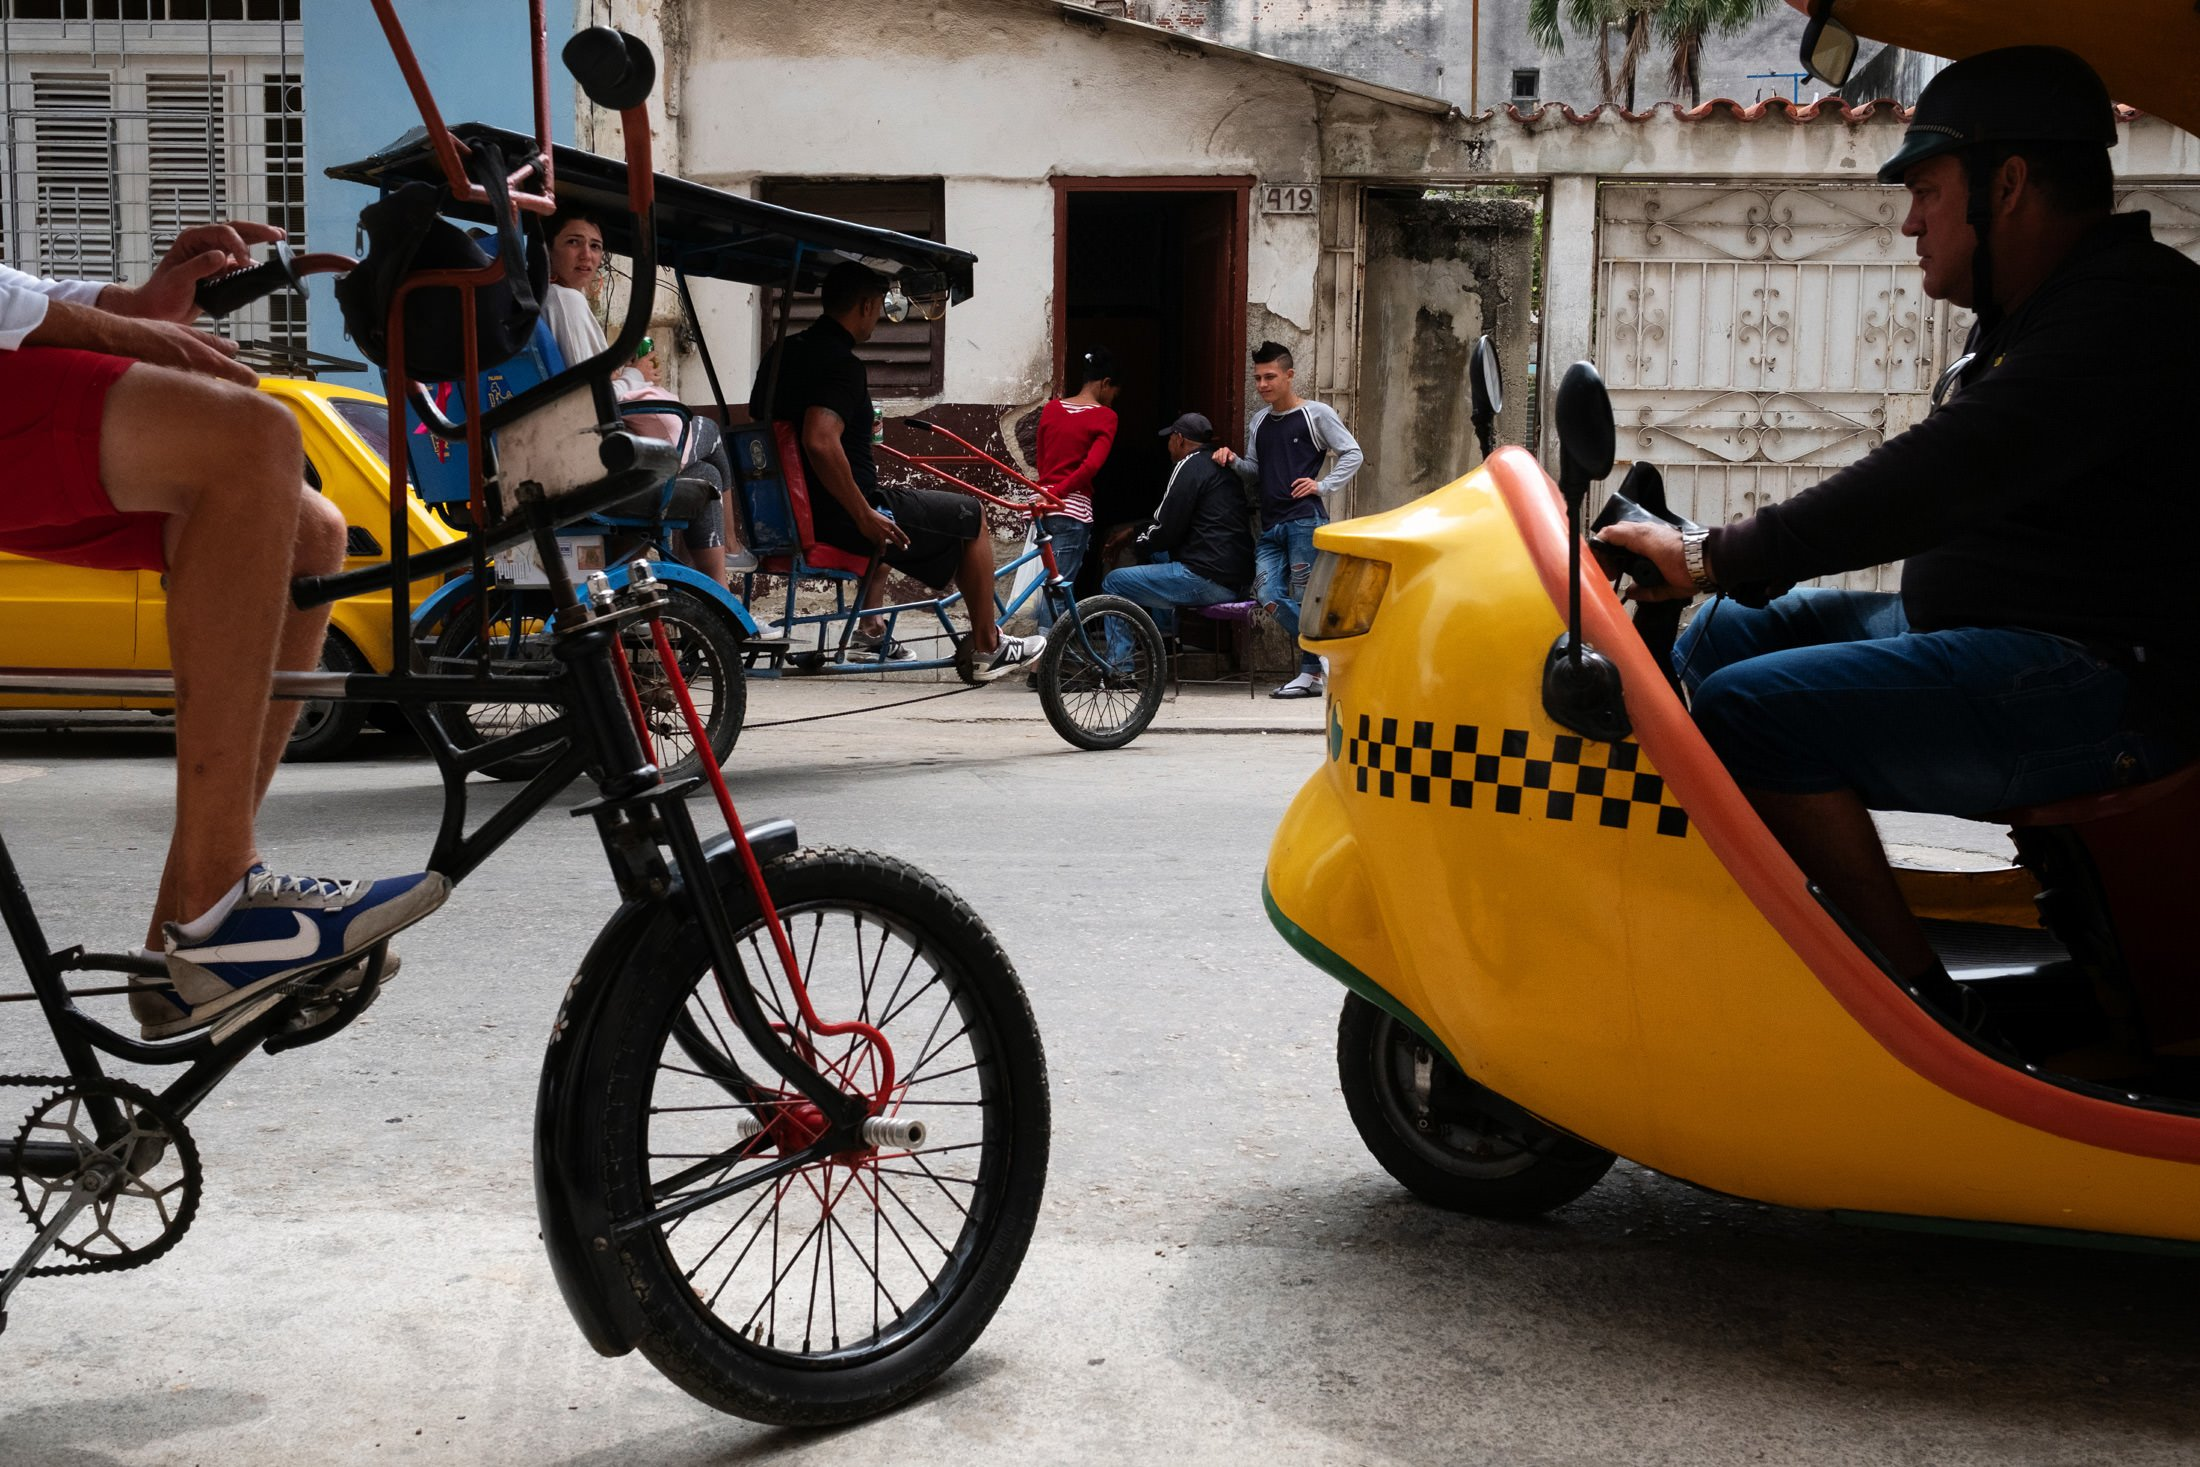 Scene in Cuba